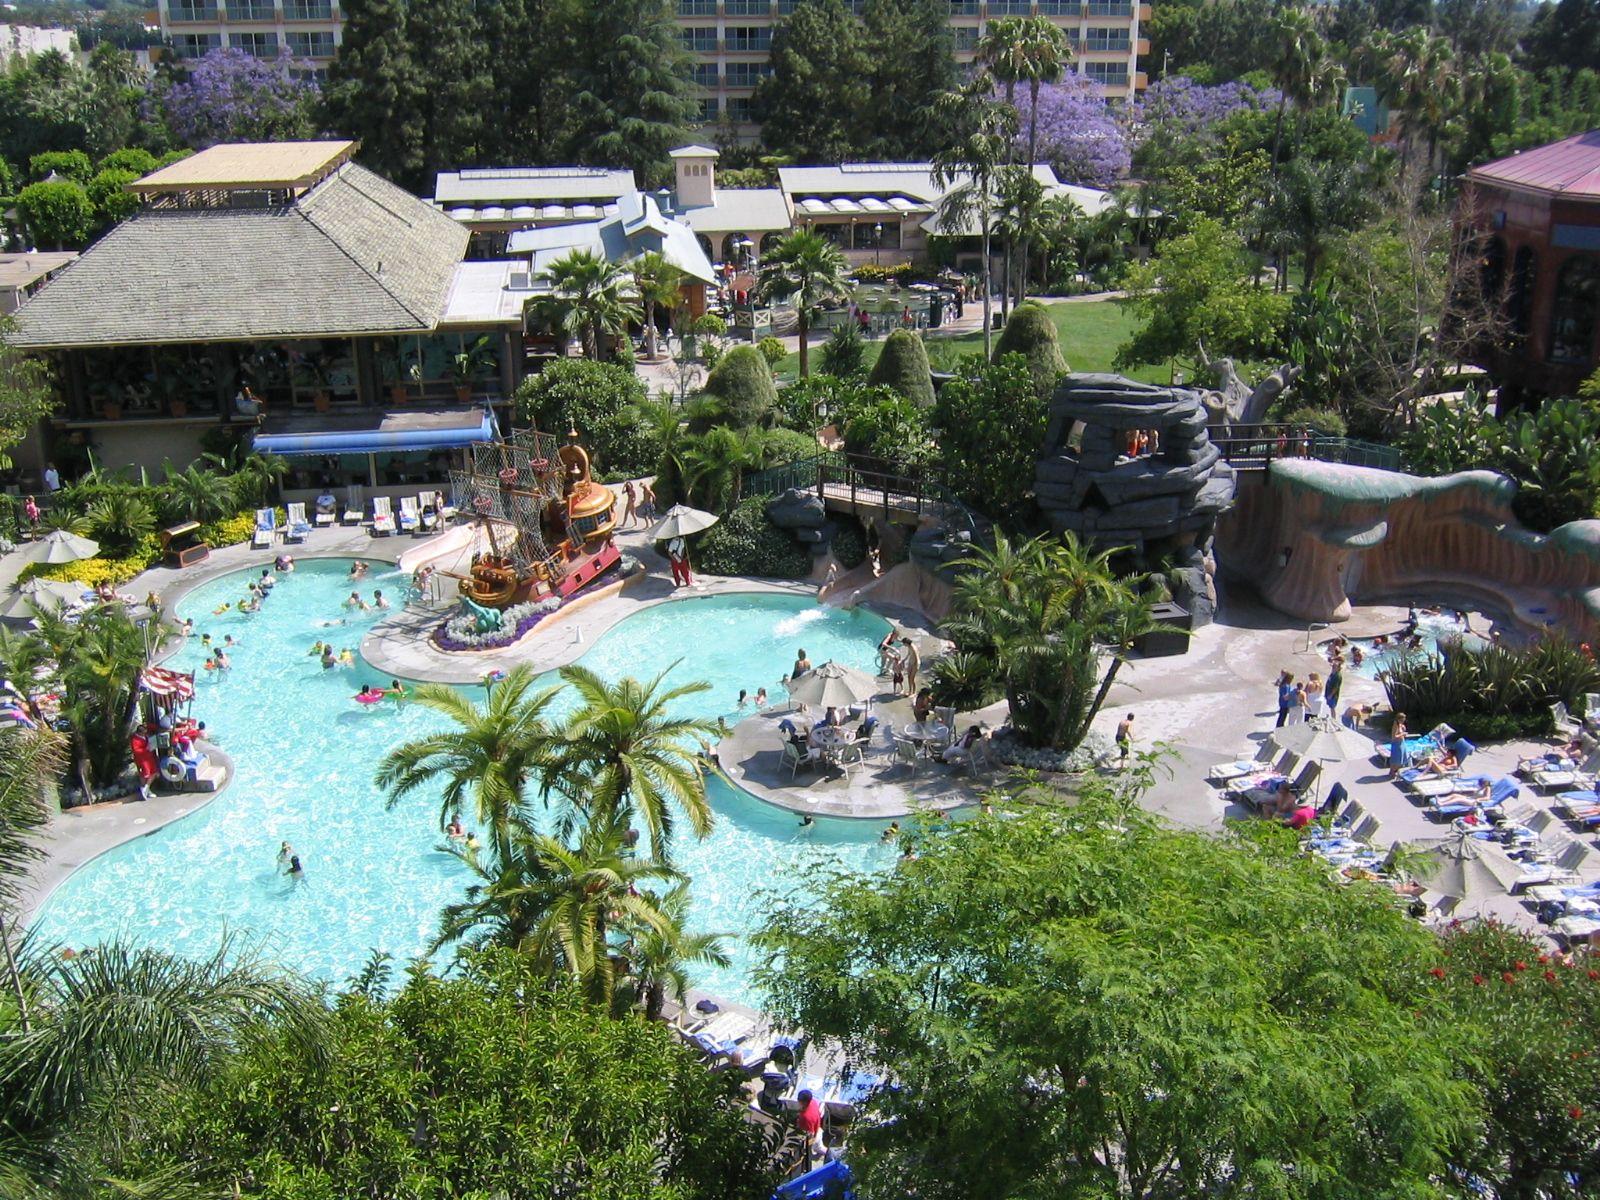 Neverland Pool Disneyland Hotel In Anaheim